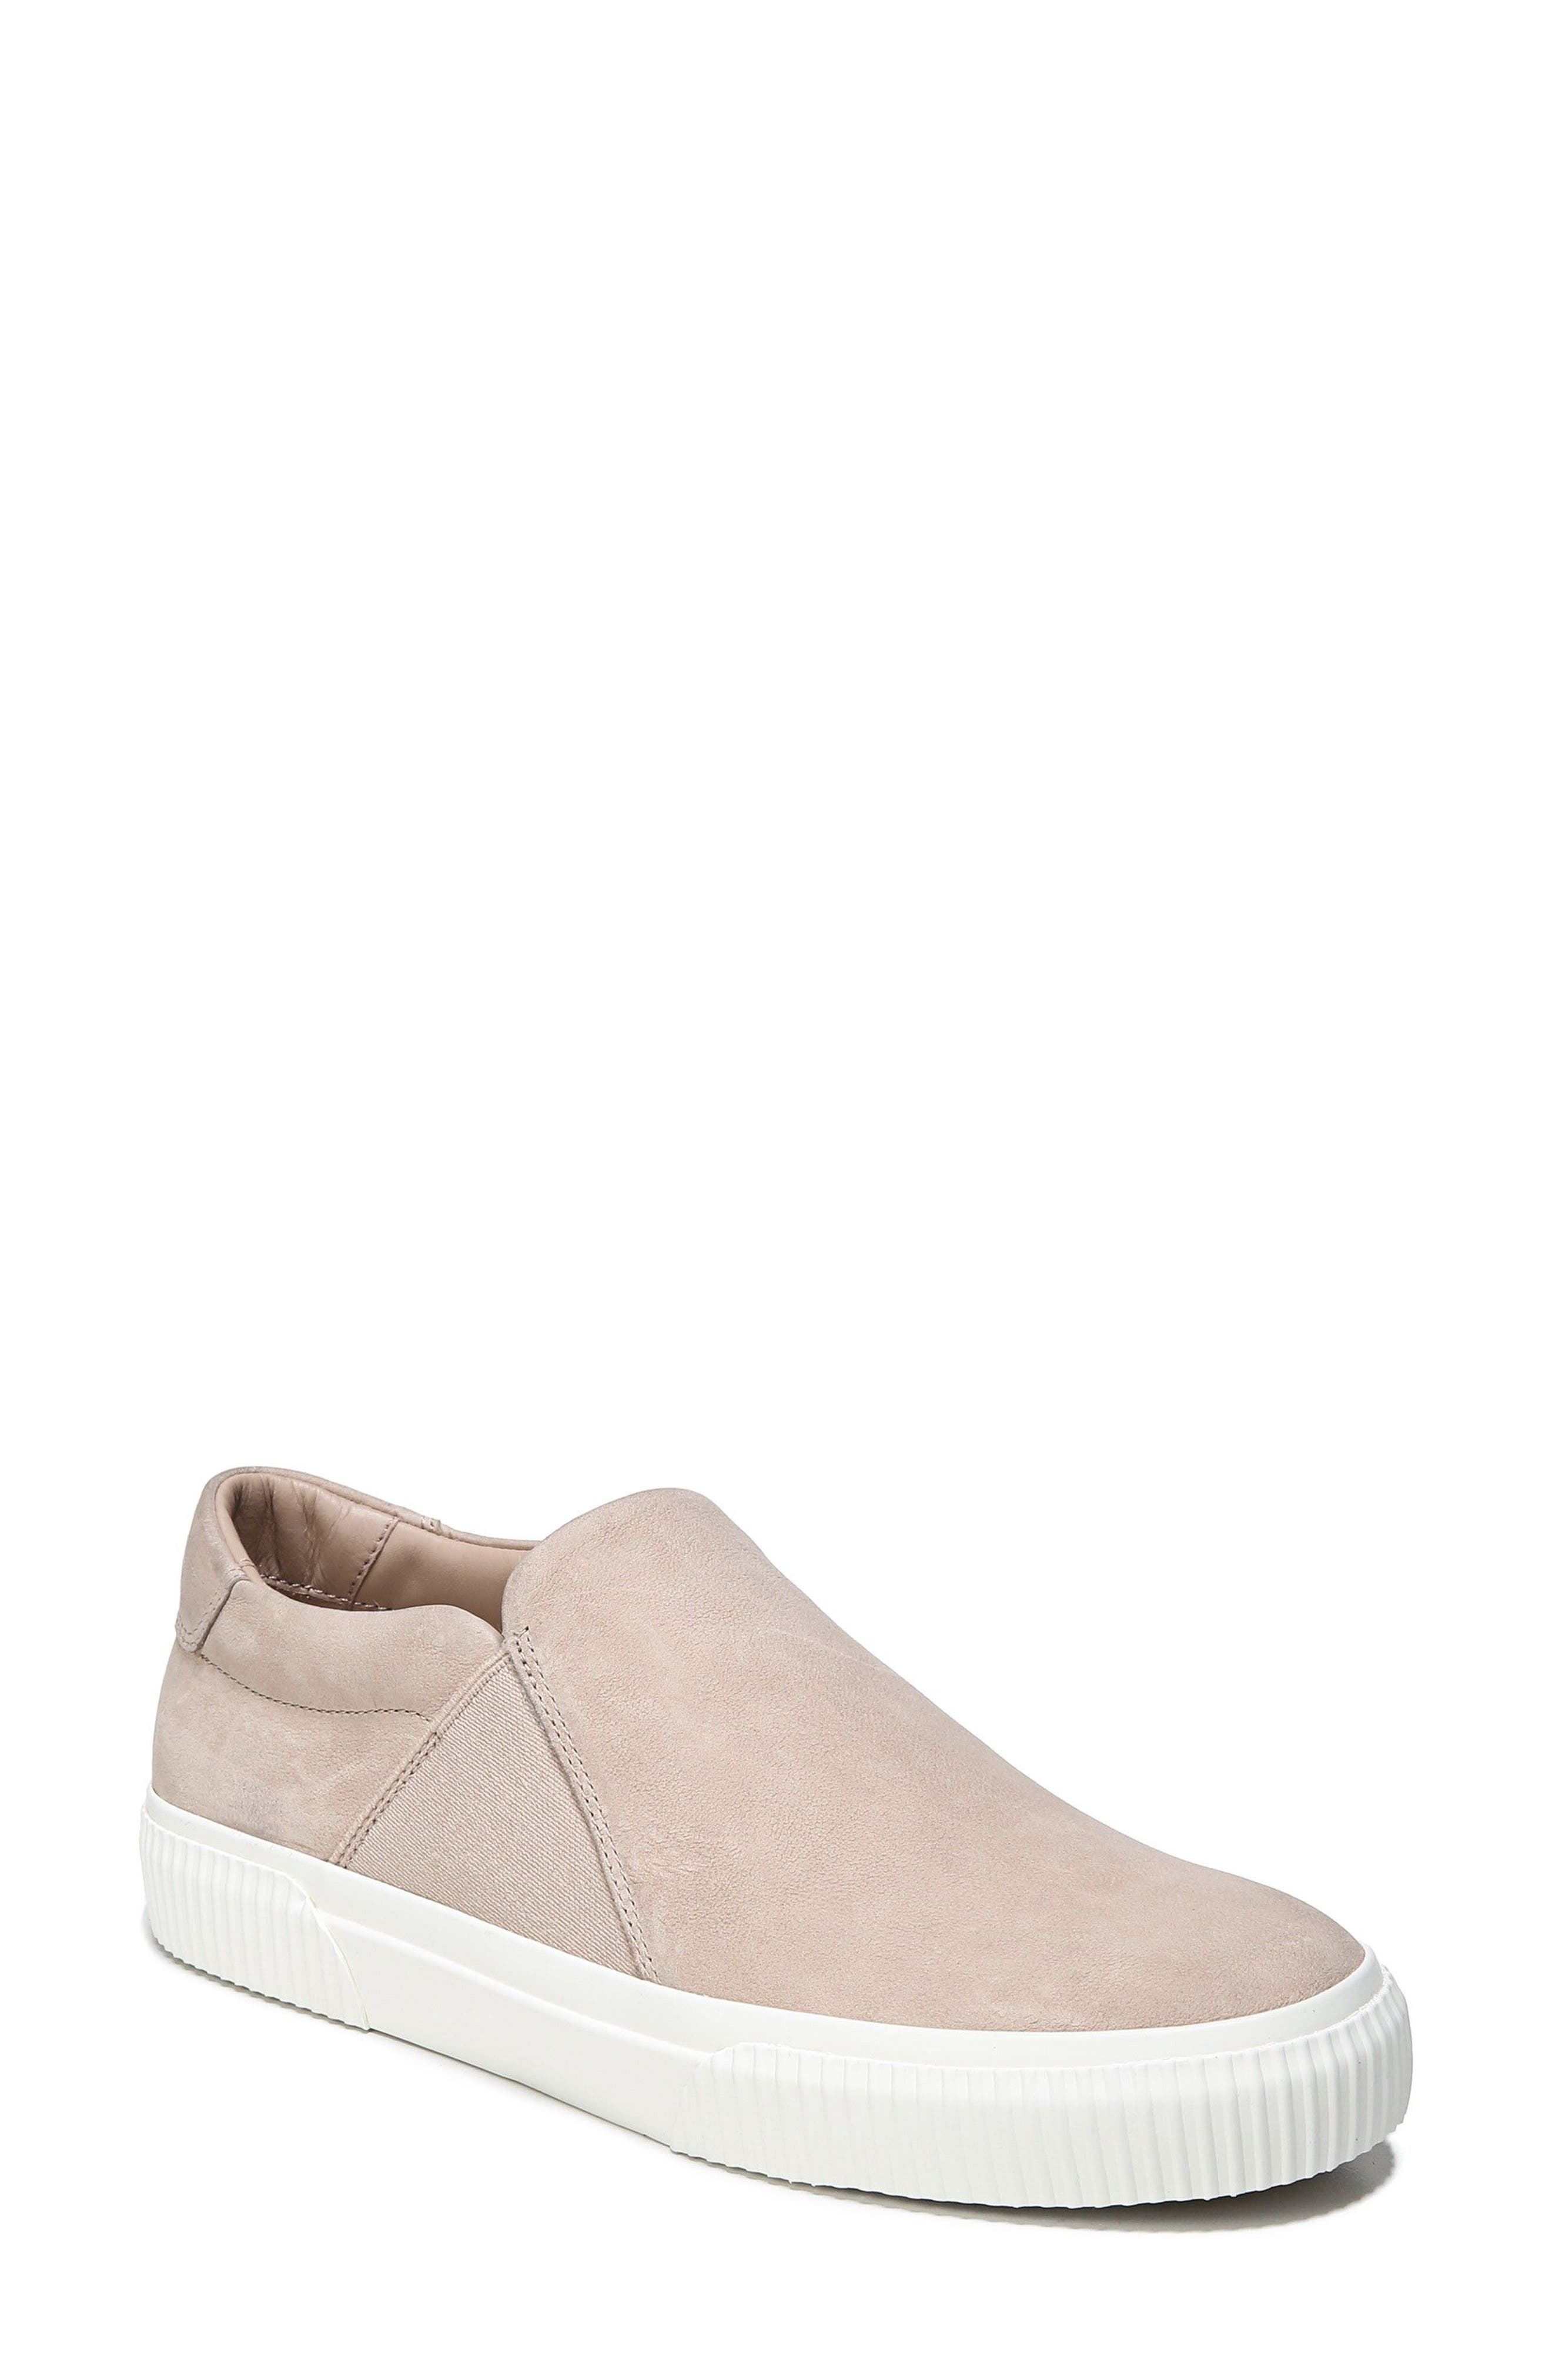 Main Image - Vince Knox Slip-On Sneaker (Women)